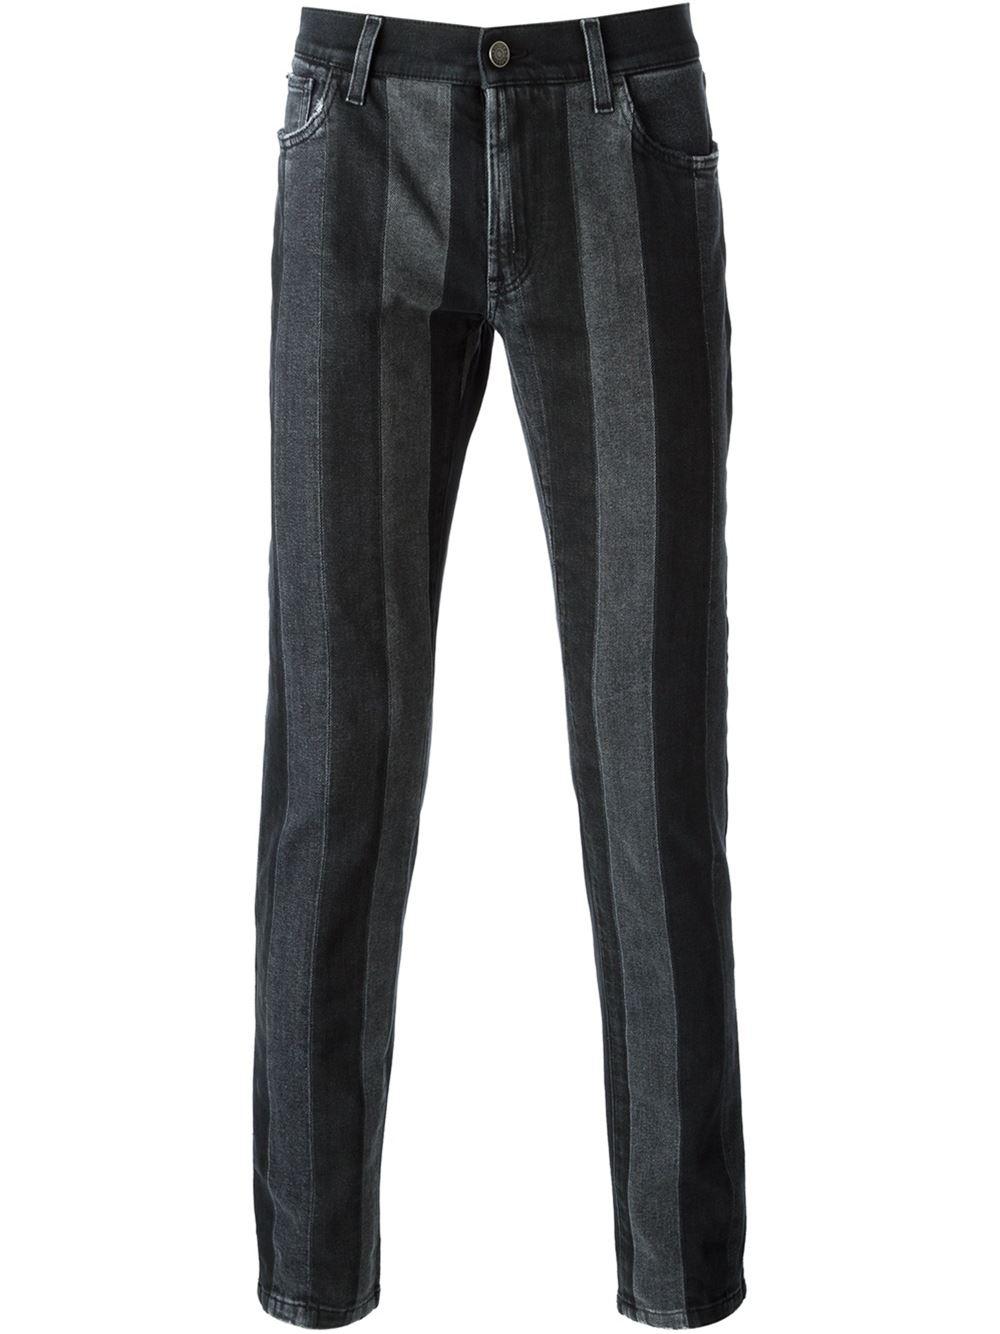 Black Slim Fit Jeans Men